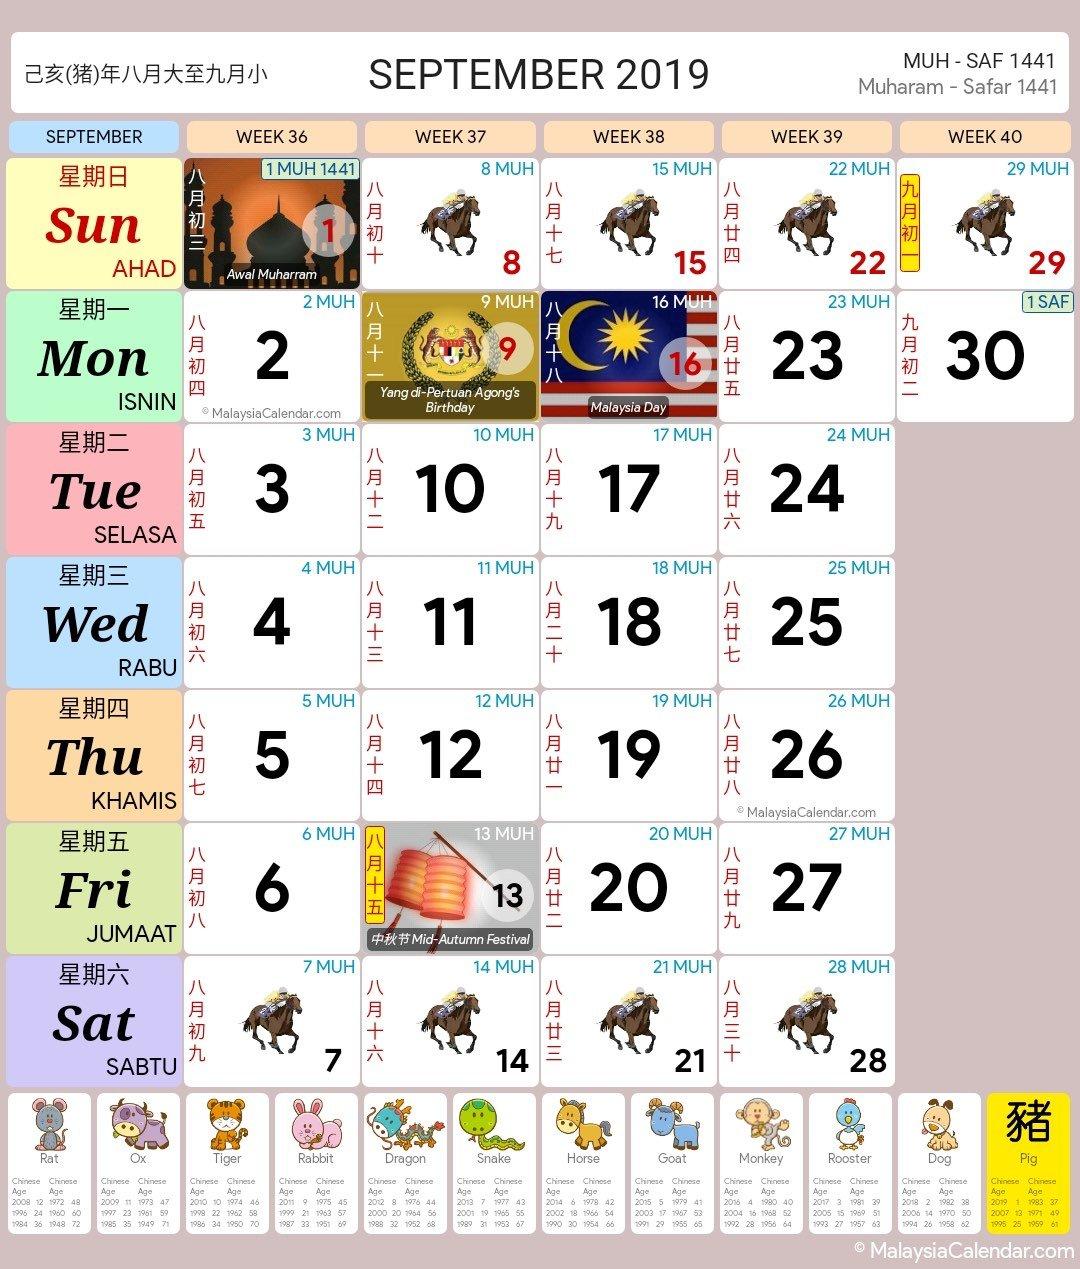 Malaysia Calendar Year 2019 (School Holiday) - Malaysia Calendar Calendar 2019 Kuda